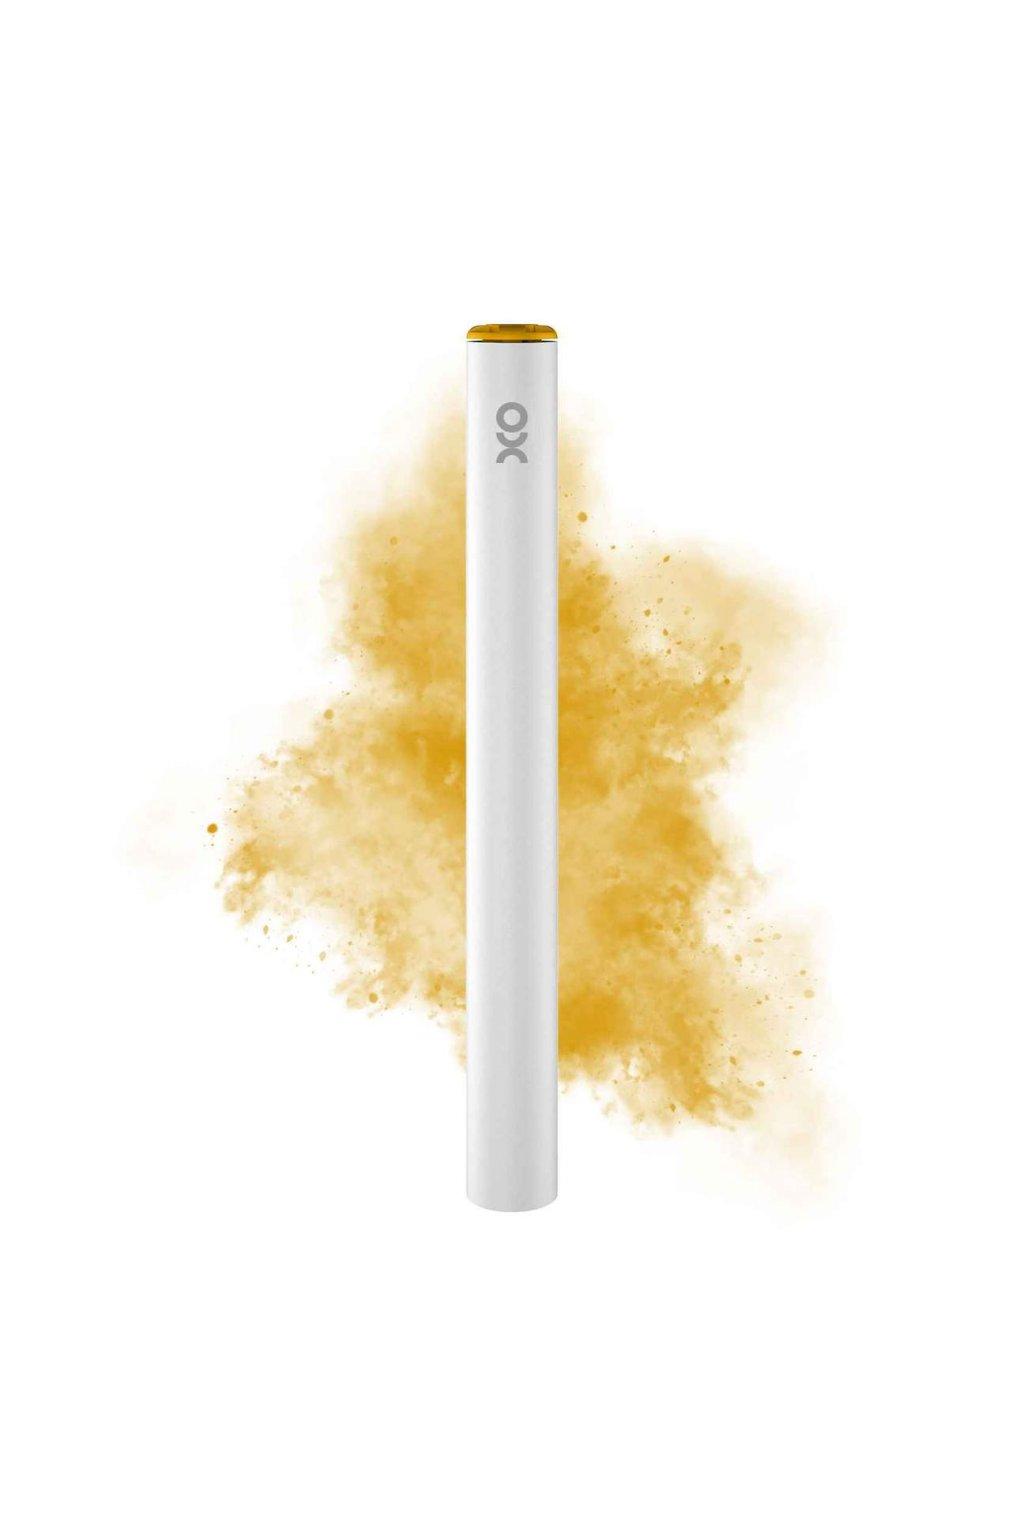 OrangeMan Nicotine Stick Virginia 1 min